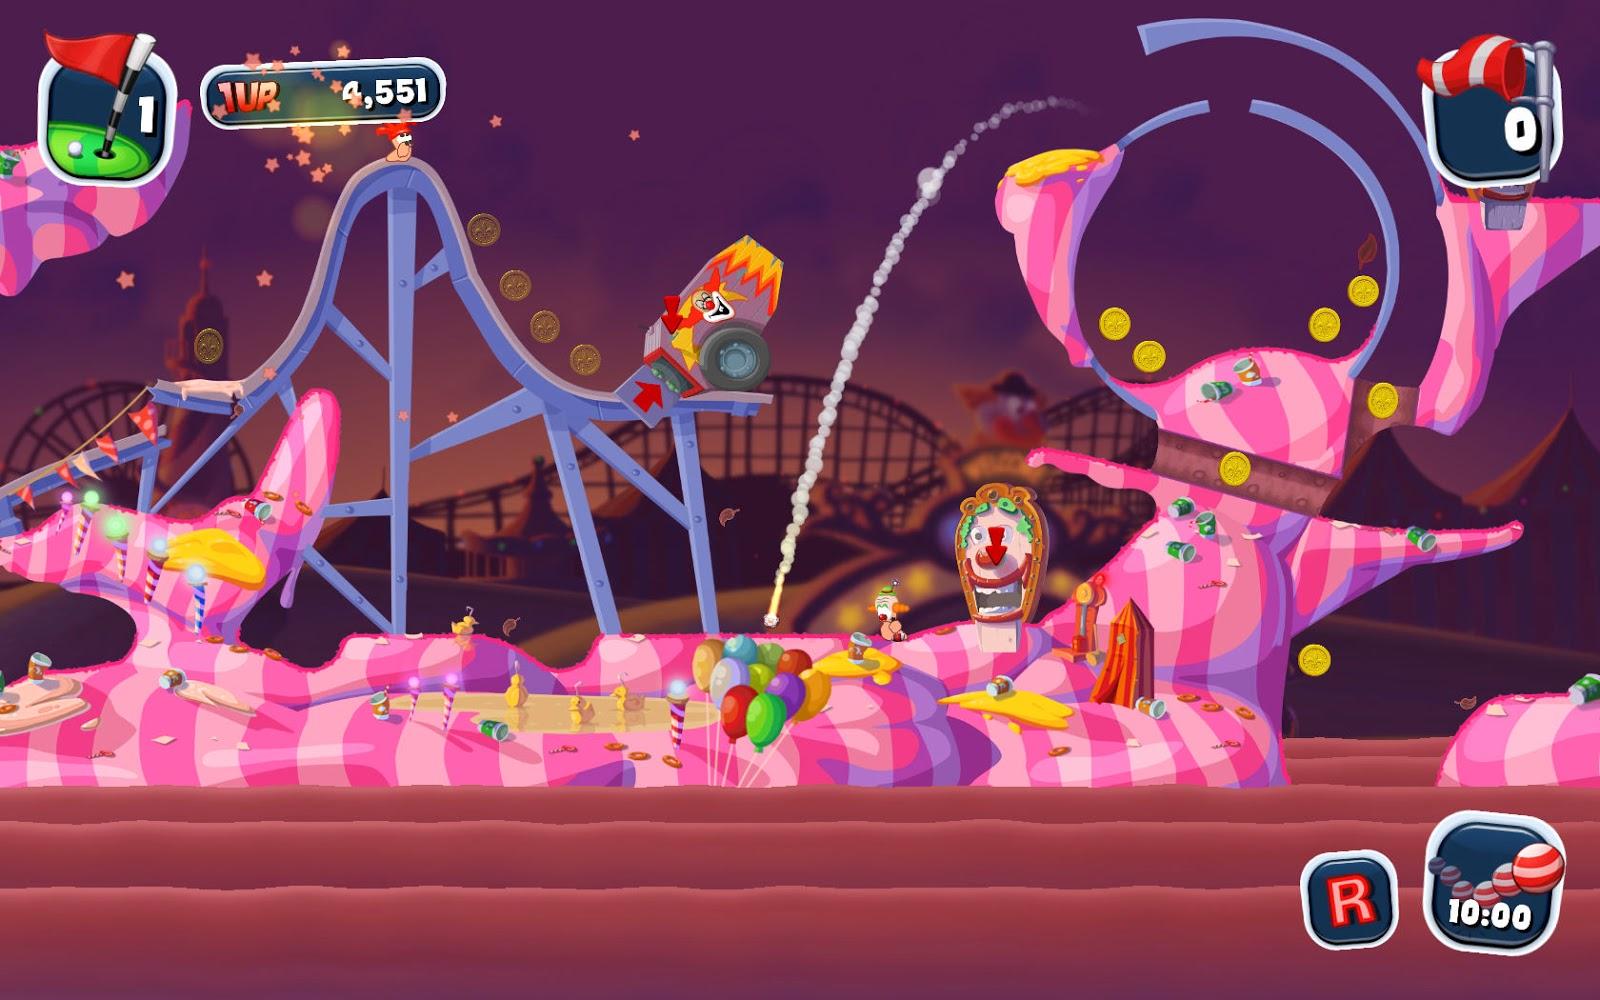 Worms Crazy Golf gameplay